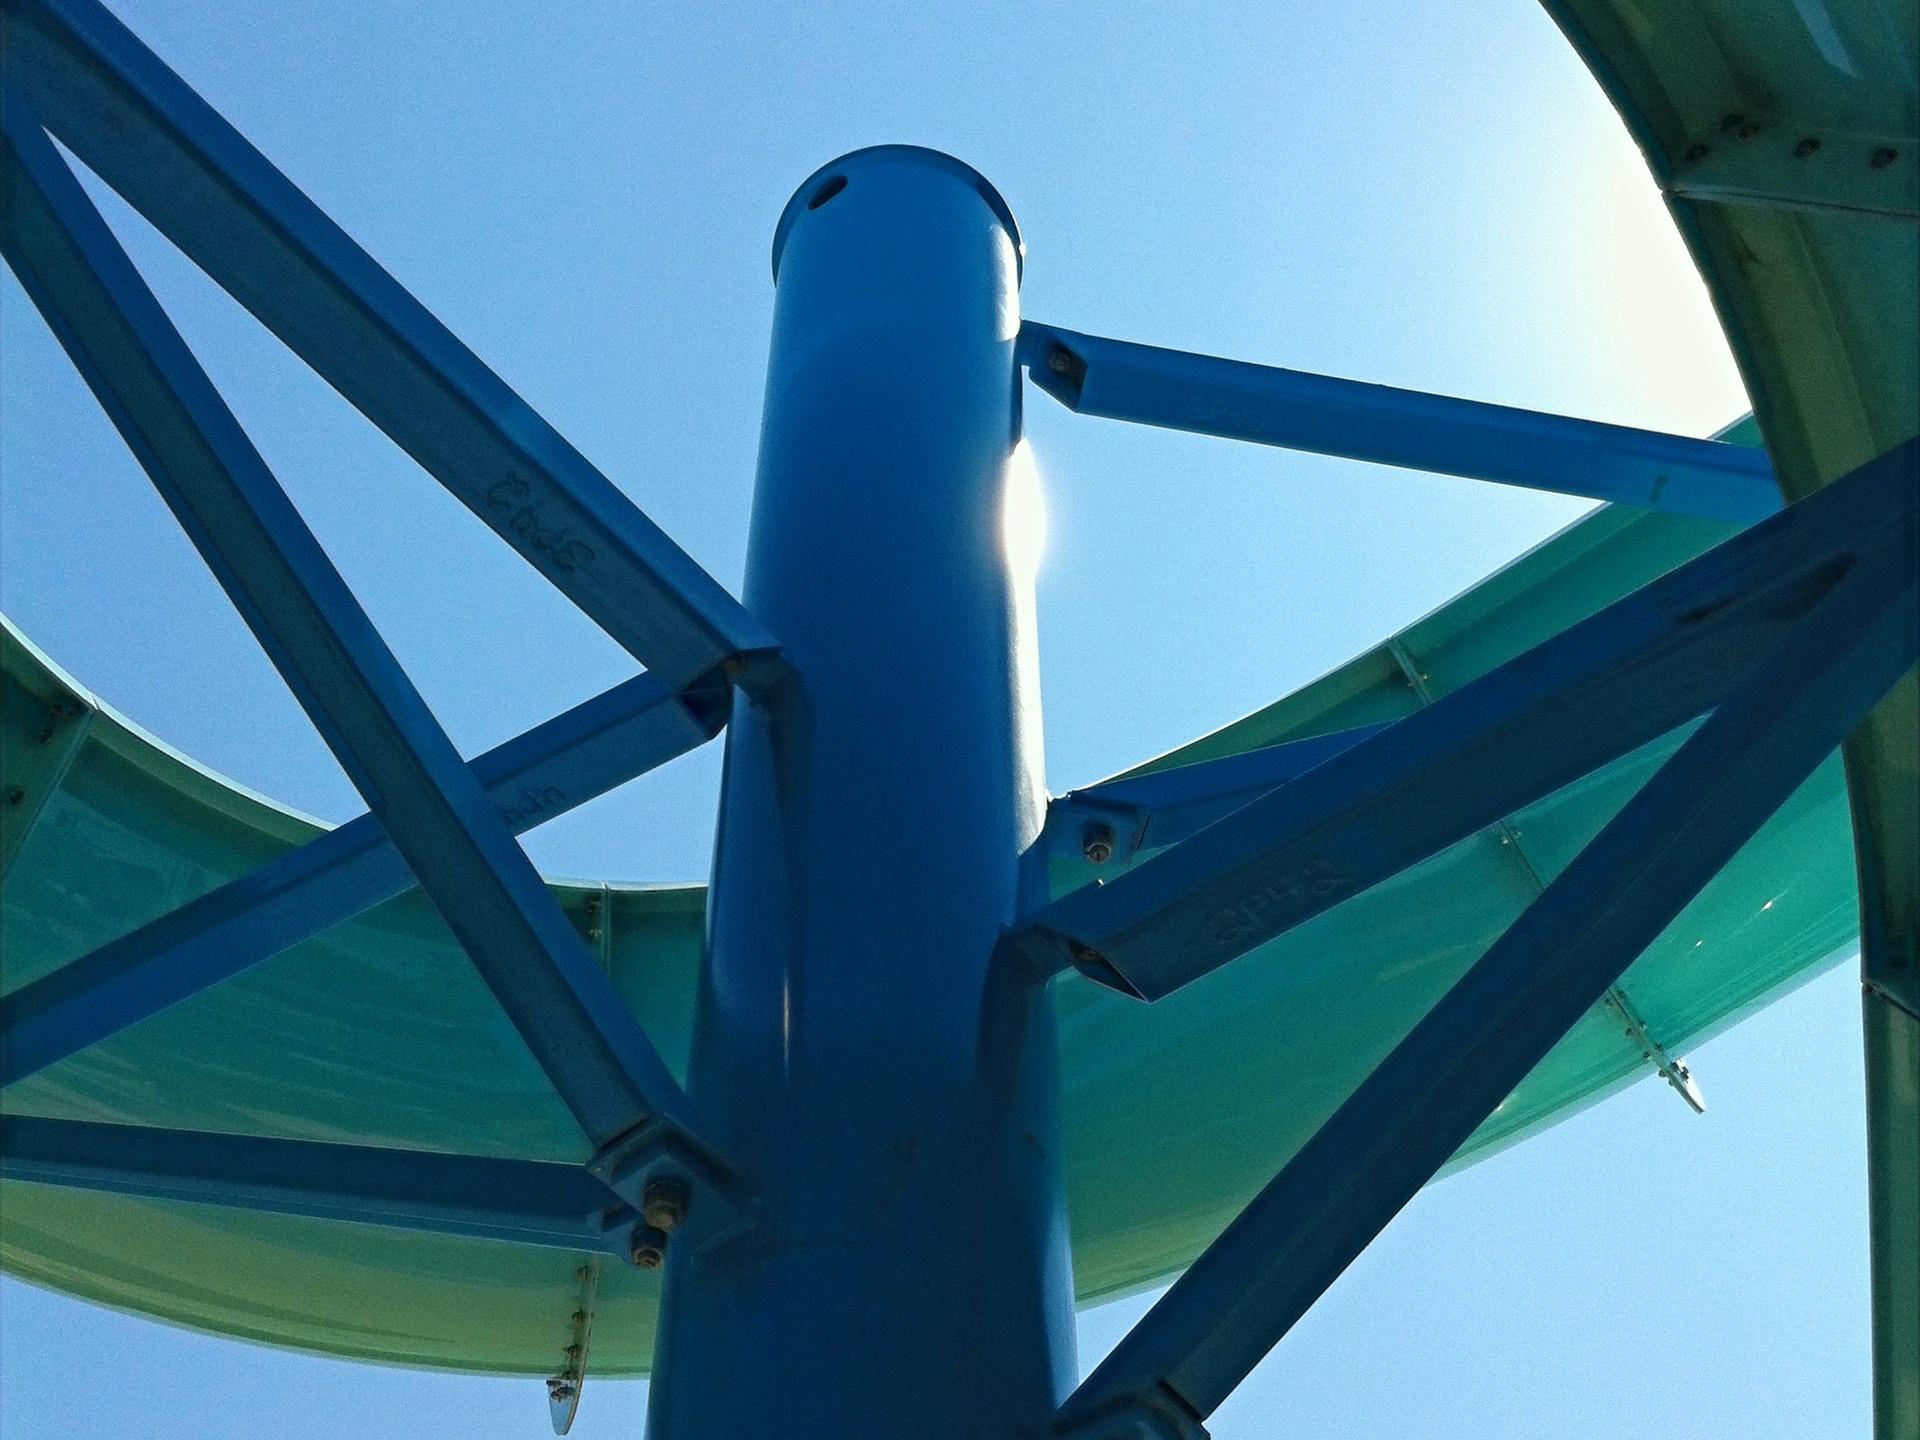 Mayfair Outdoor Slide